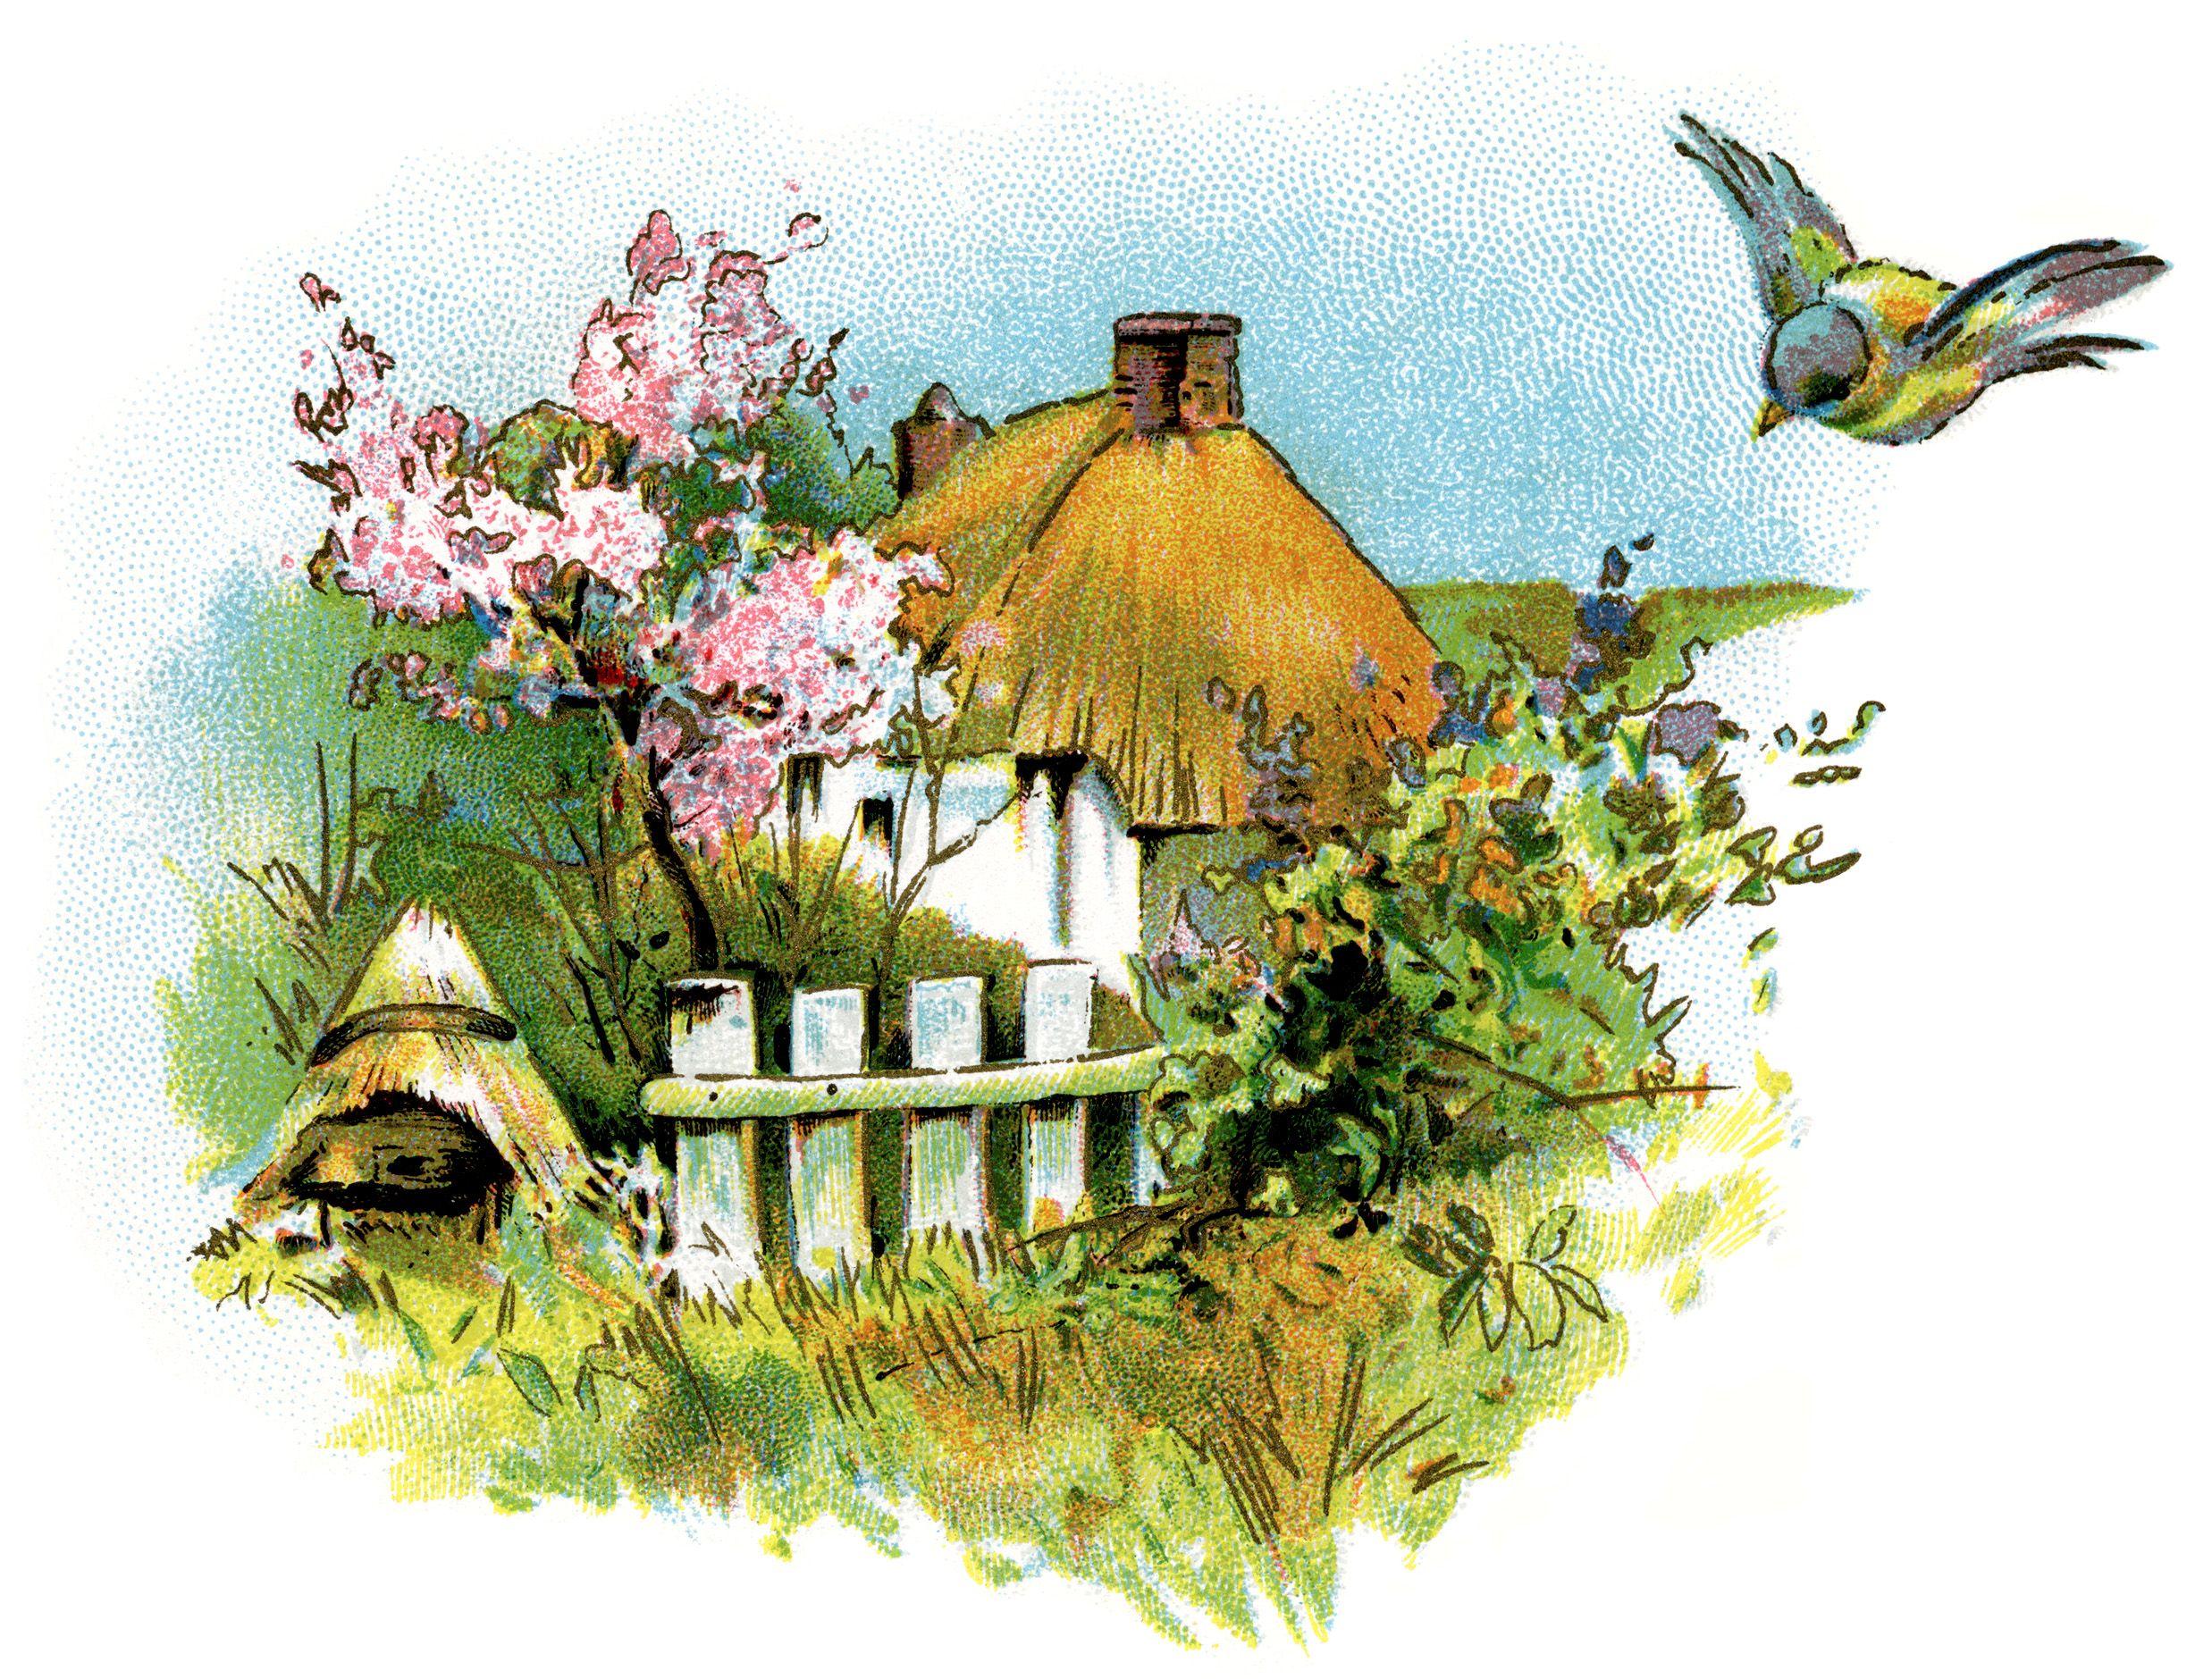 Small Country Cottage Clip Art   Clip art vintage, Cottage art ...